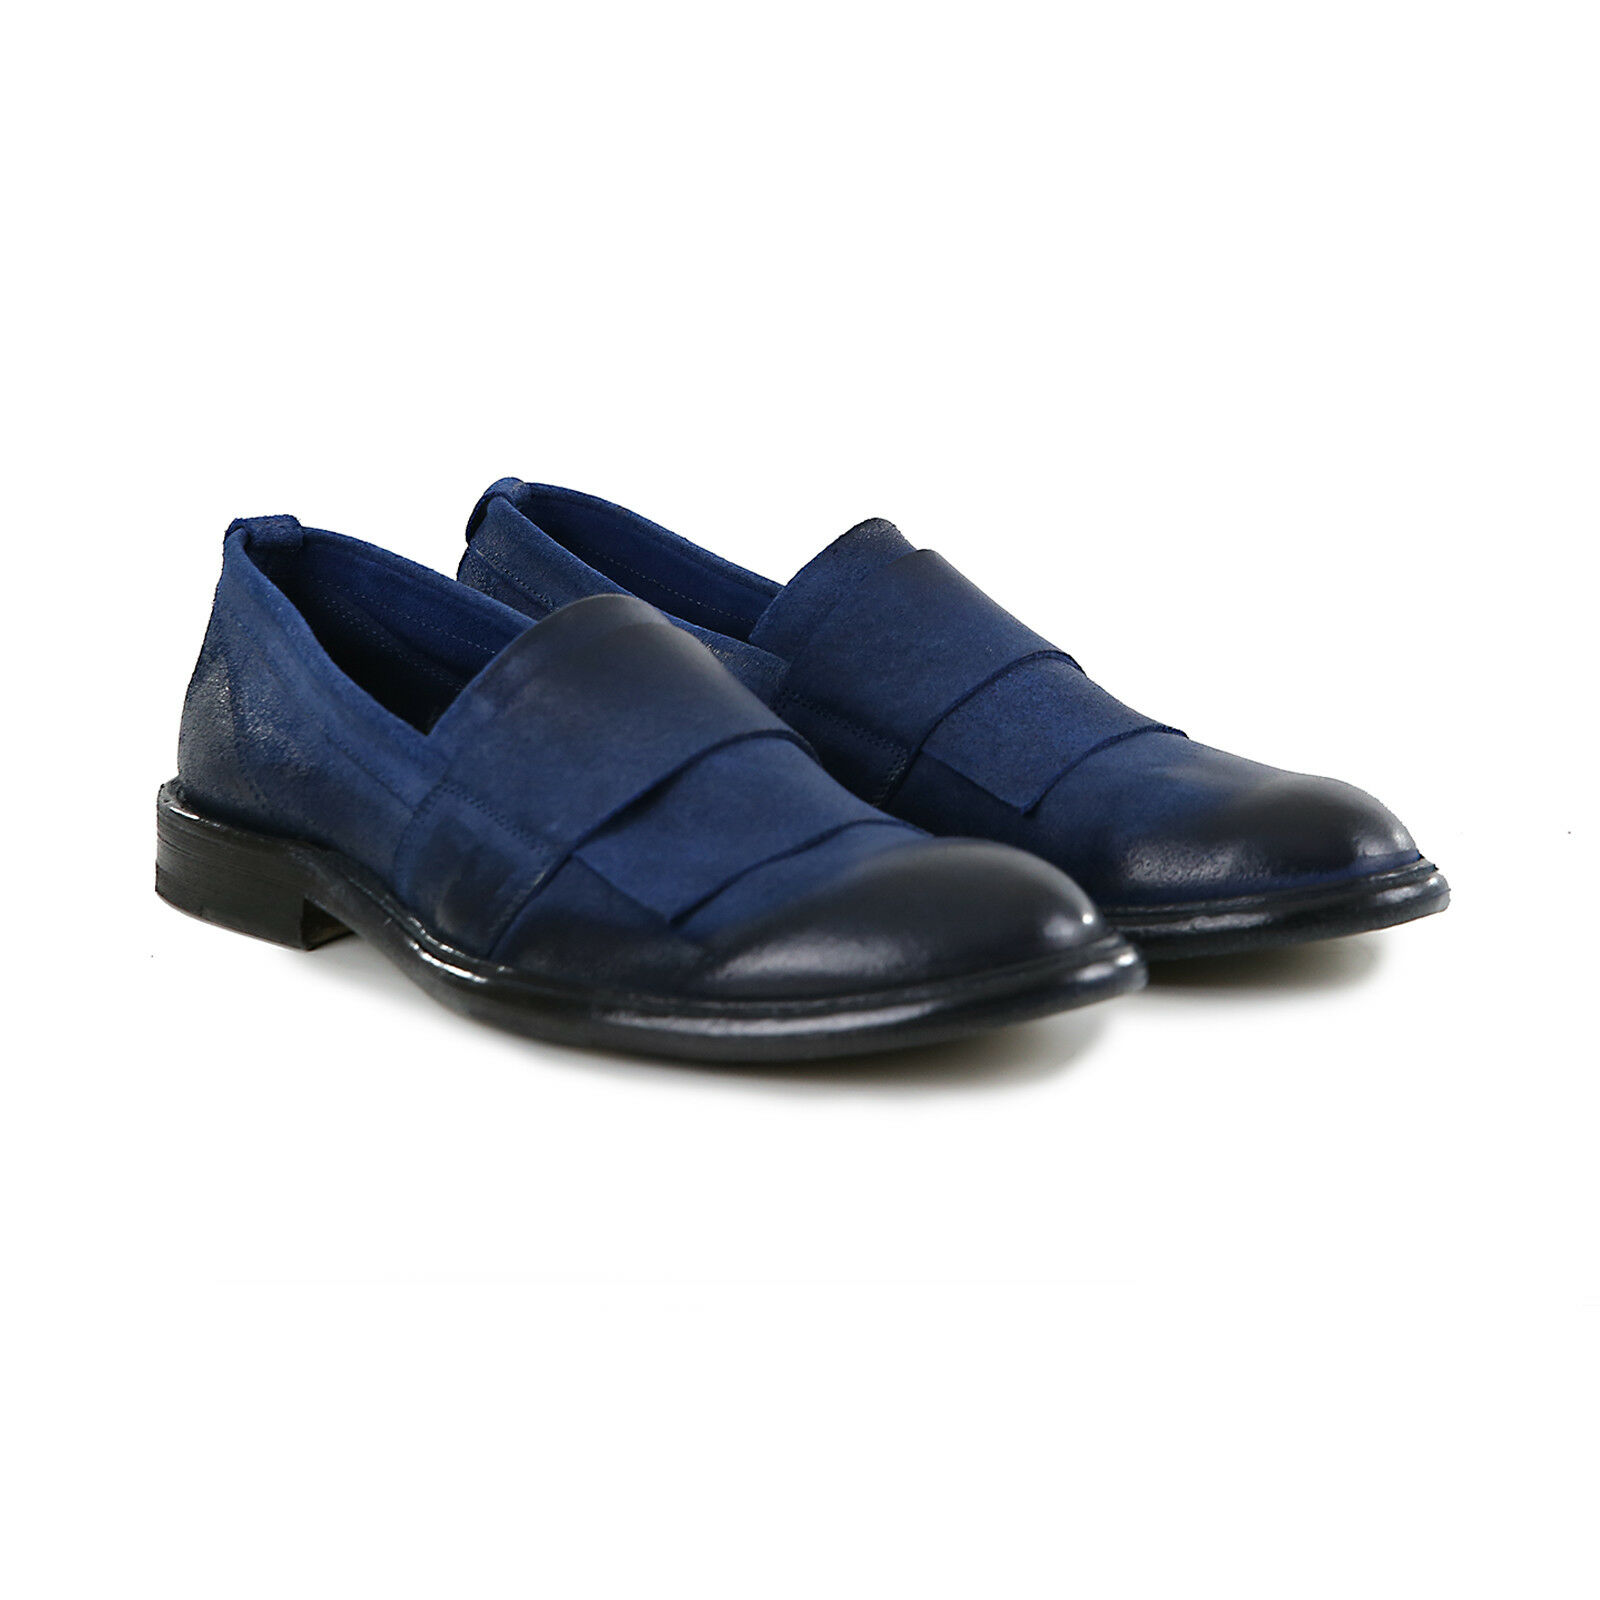 Mocassino men in Pelle in crosta cerata blue shoes Artigianali Made in